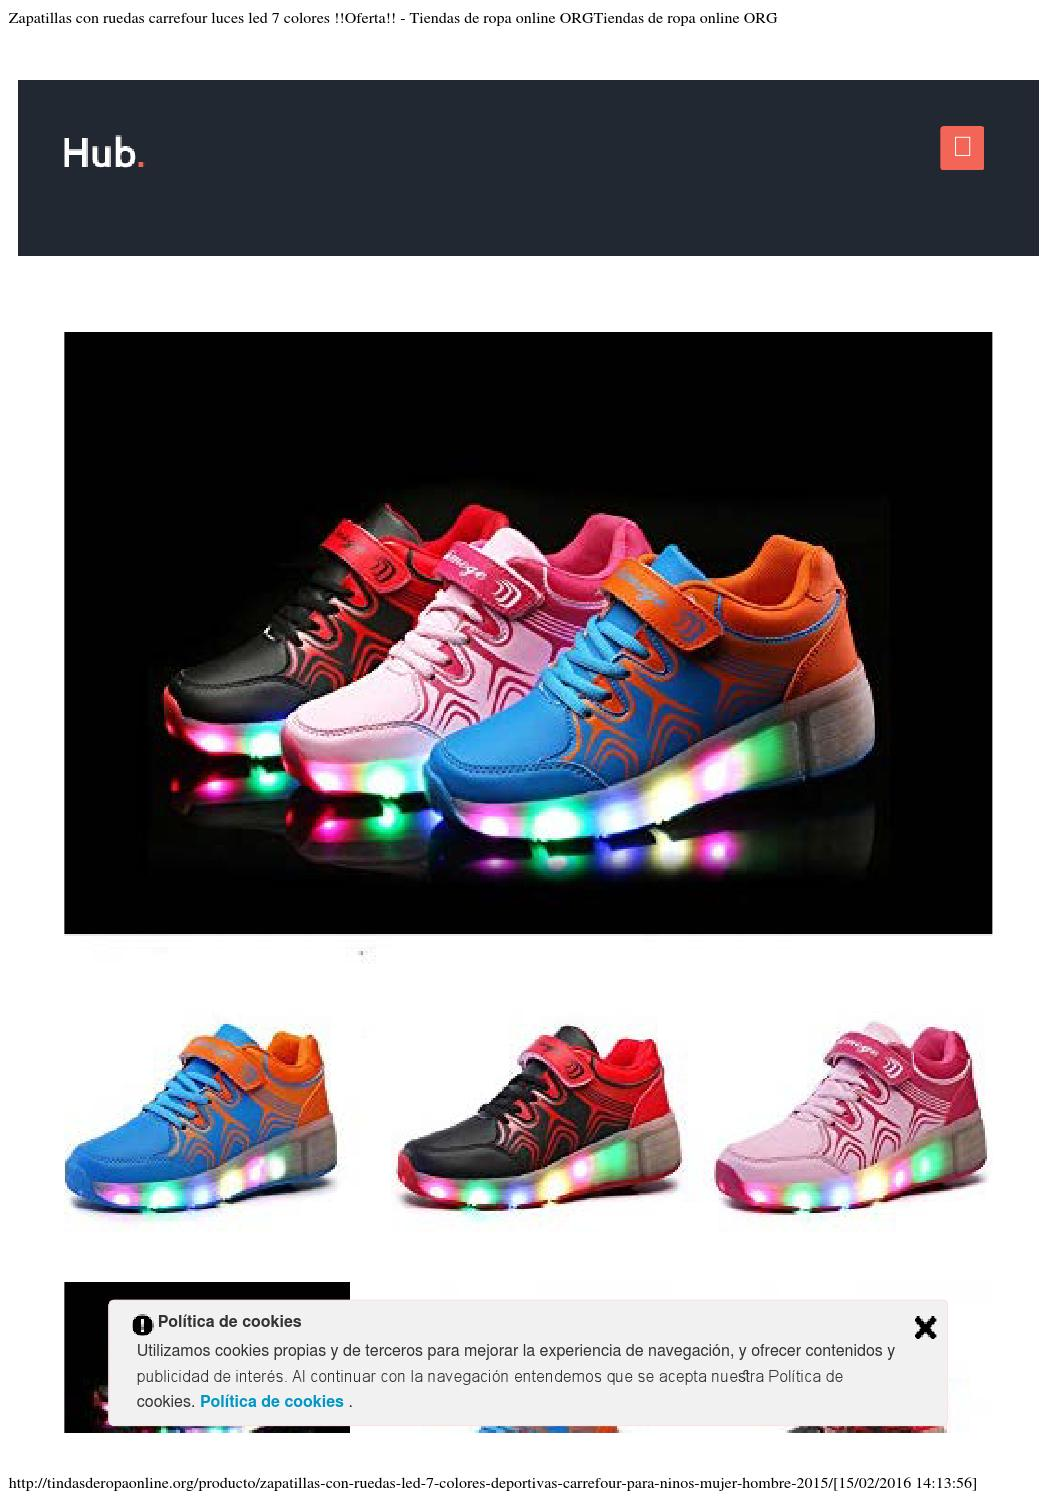 Zapatillas Ruedas Led Carrefour Luces Con 7 ColoresofertaBy hdsrCQxt